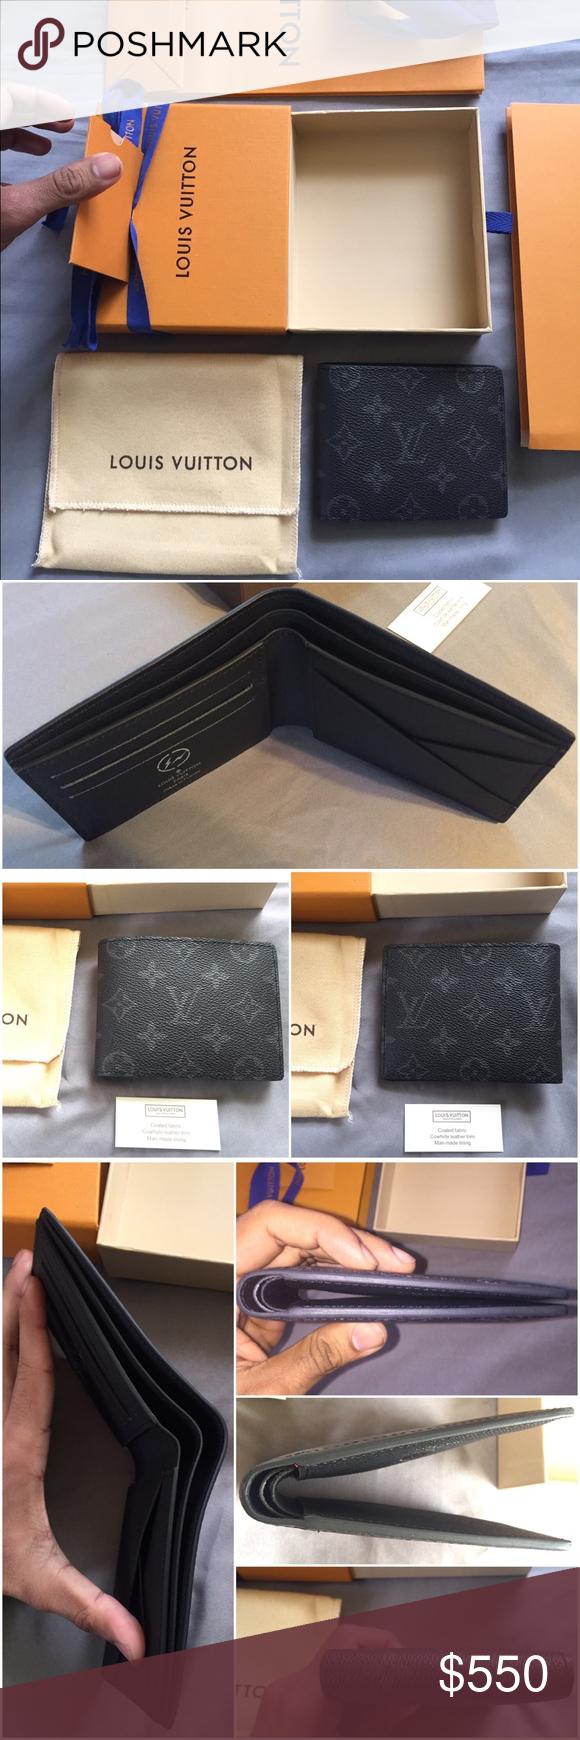 48191545b467 Louis Vuitton Monogram Eclipse Lim Wallet Limited X fragment LV men s  Multiple Wallet in the new